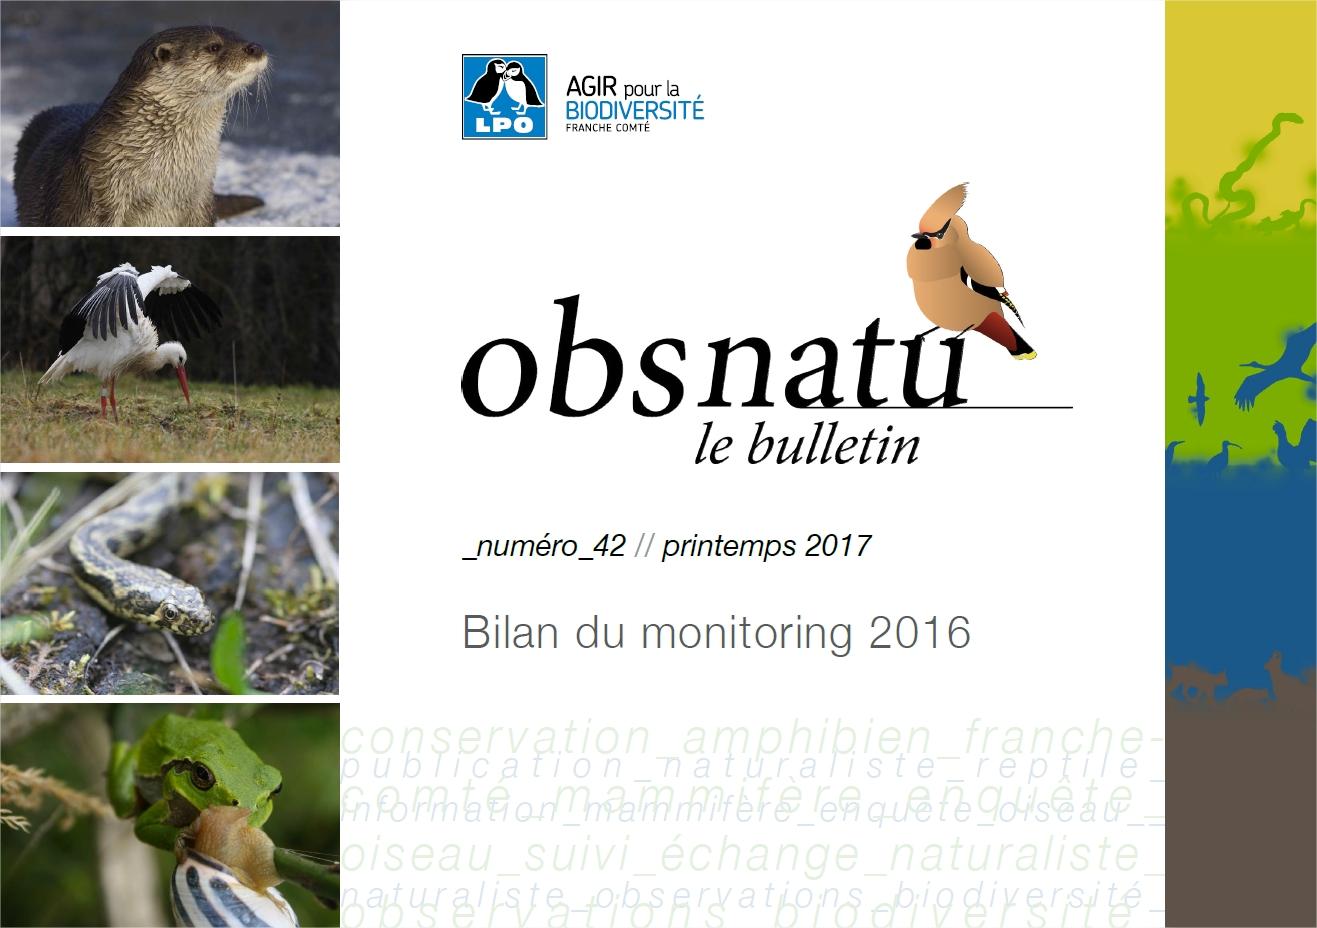 https://cdnfiles1.biolovision.net/franche-comte.lpo.fr/userfiles/publications/Obsnatubulls/obsnatu42printemps2017-monitoring2016vf-copie.pdf